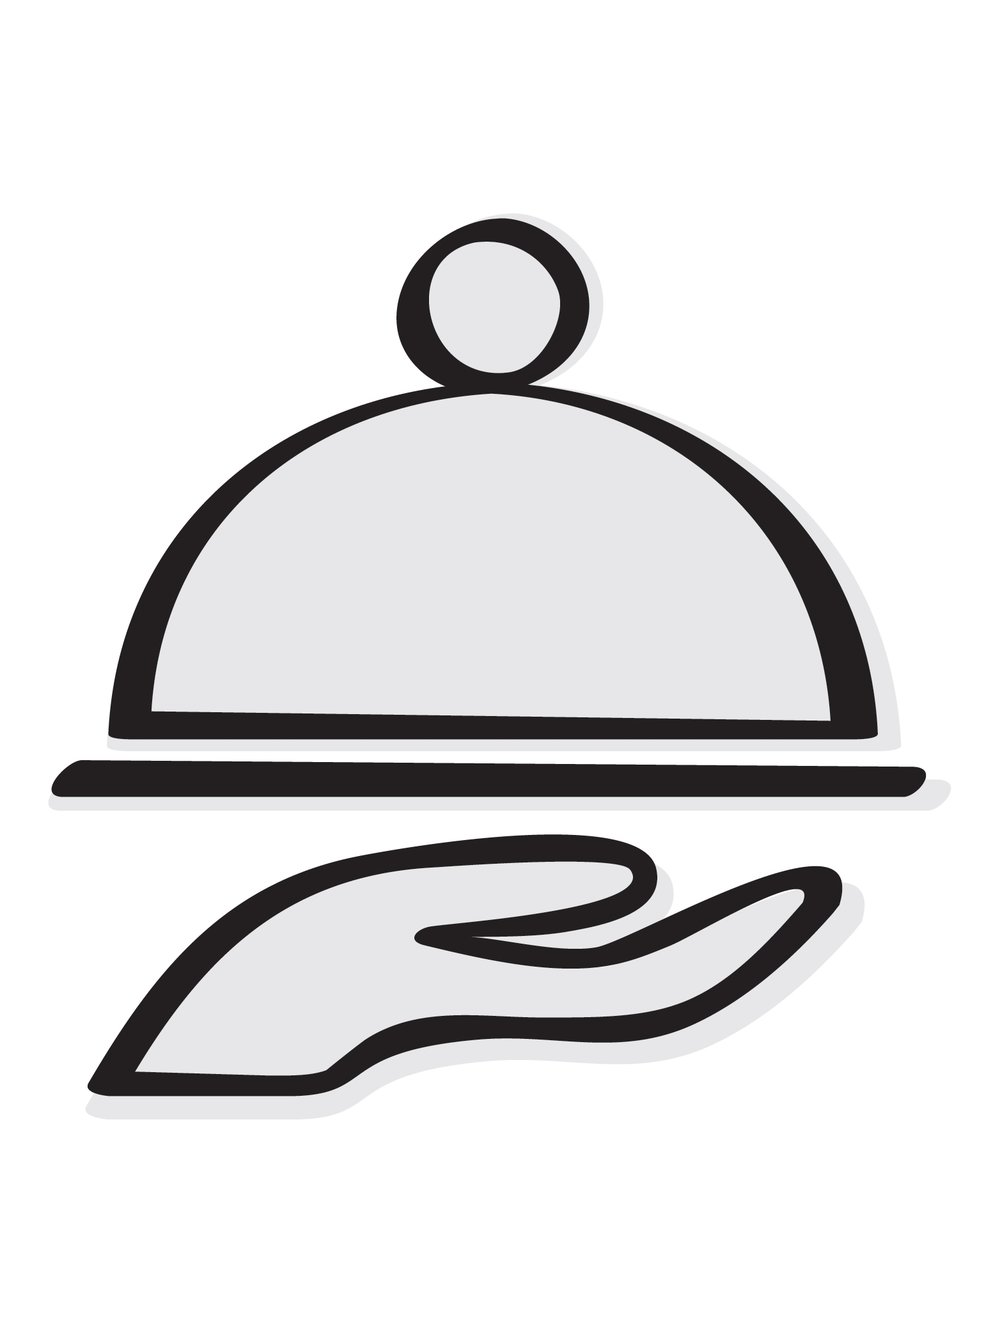 Food Service-2.jpg